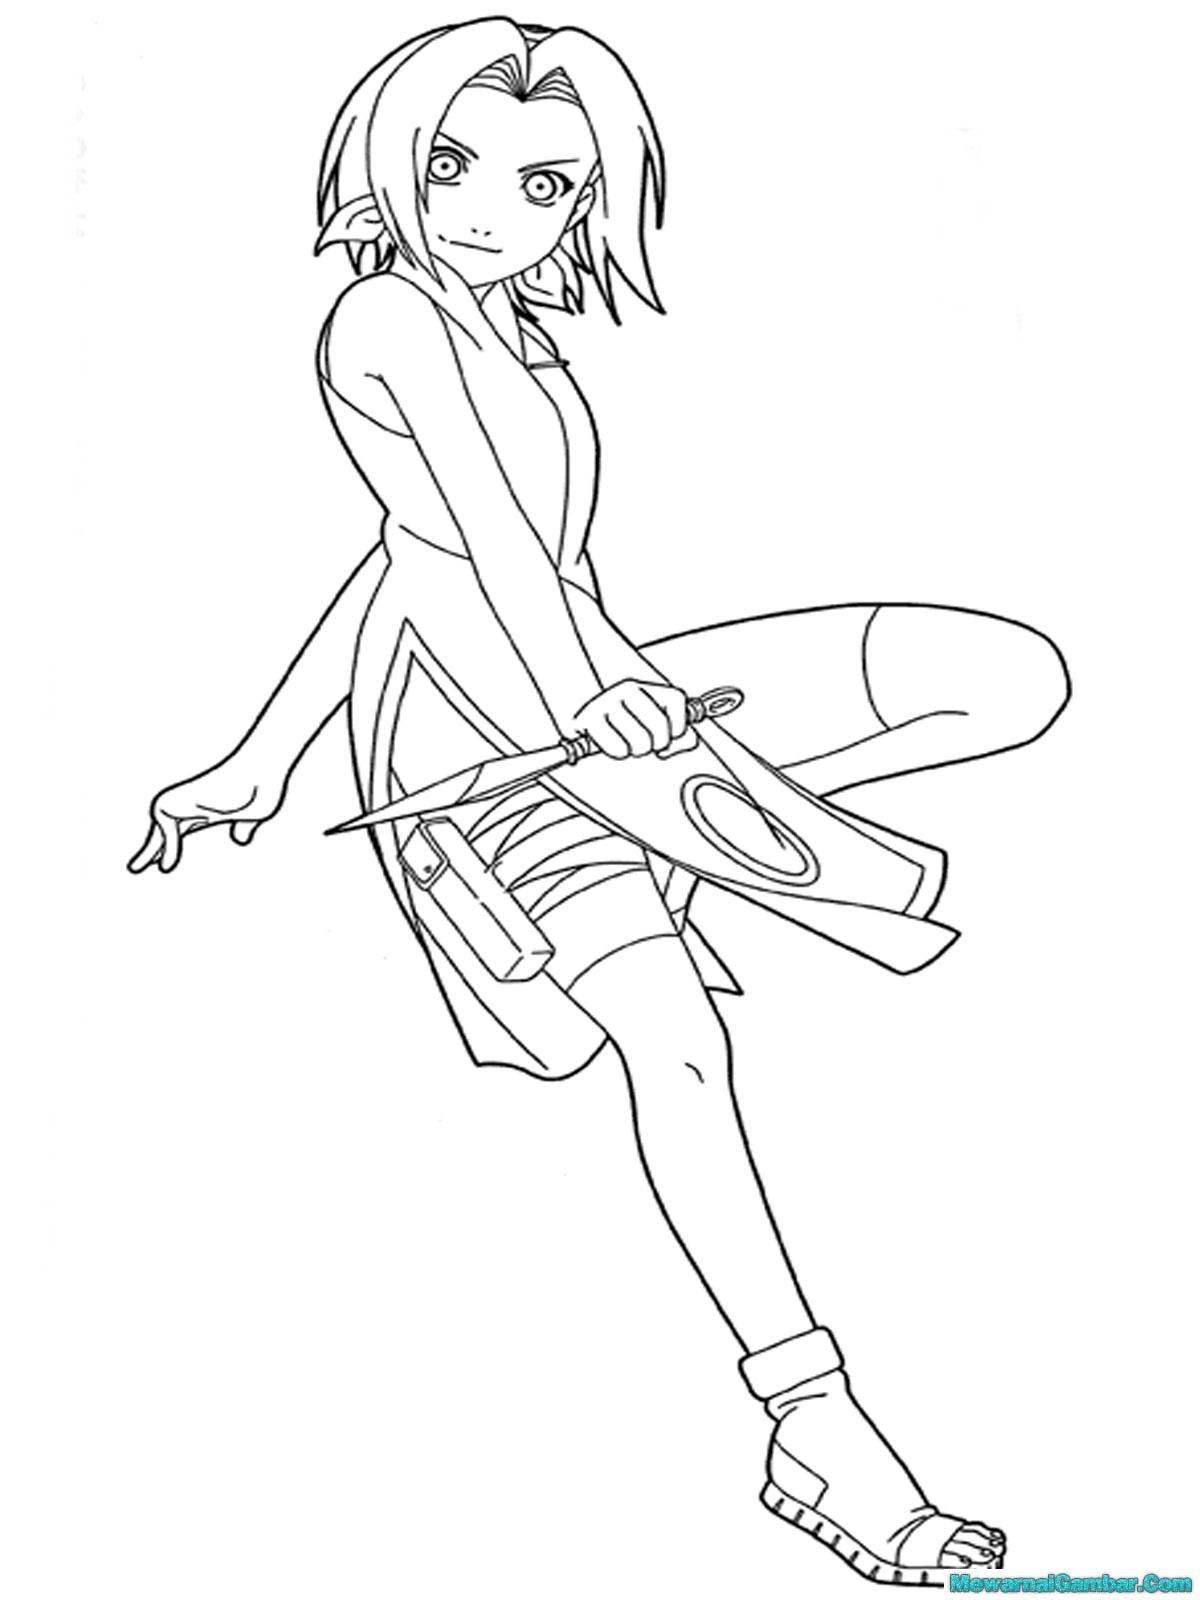 Aneka Gambar Kartun Naruto Untuk Mewarnai